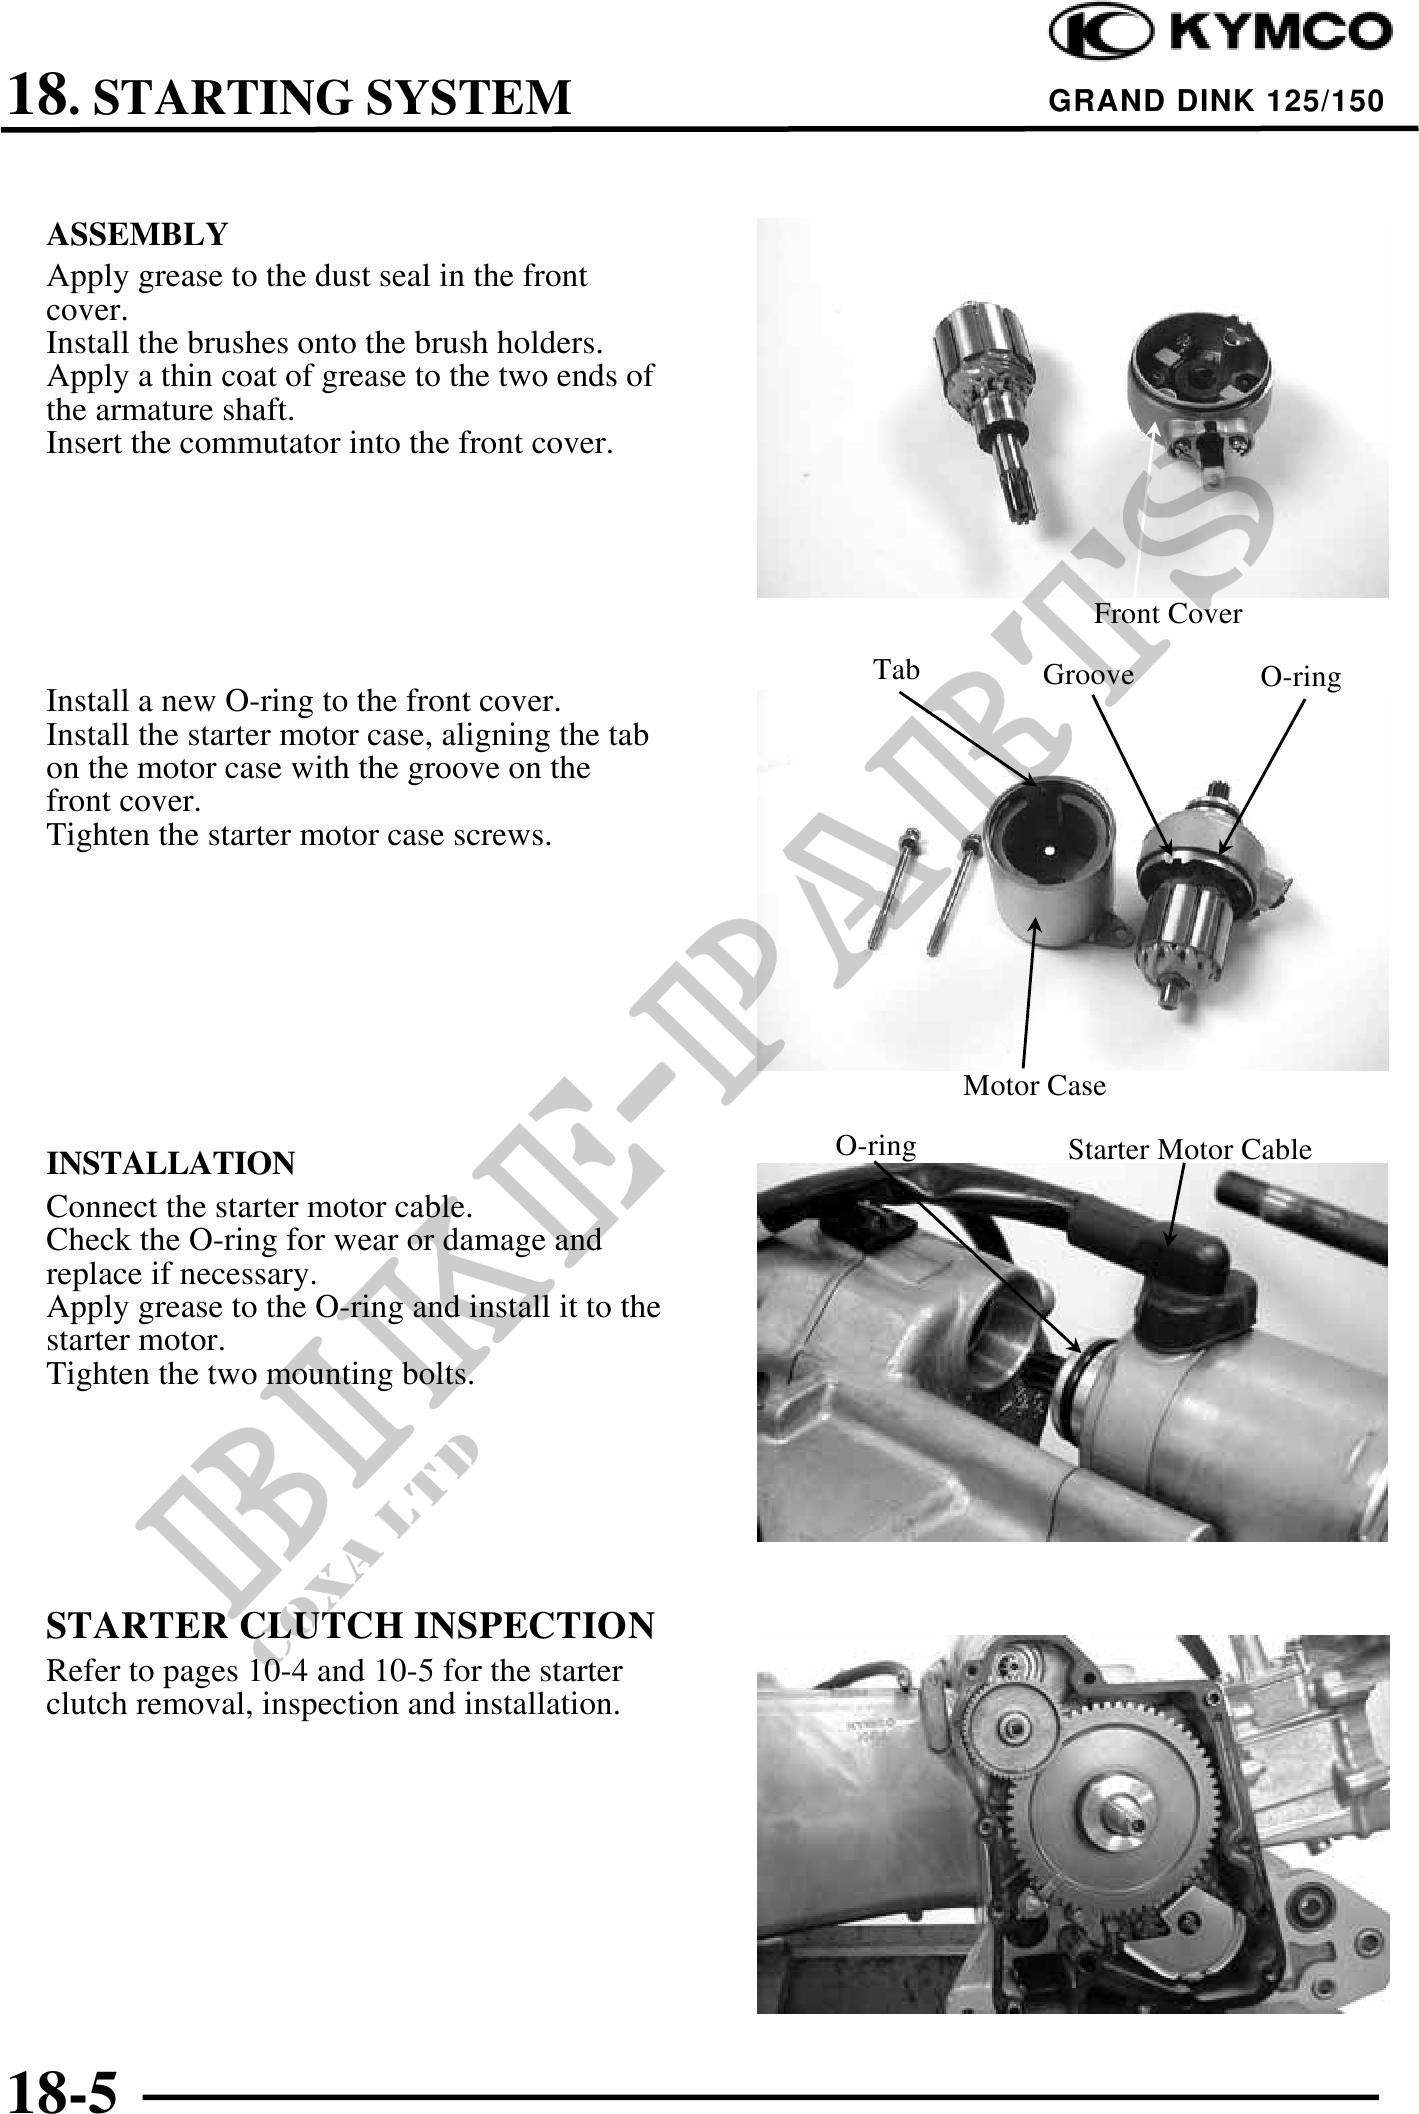 grand dink 125 mmc 2 Workshop-manual : Page 230